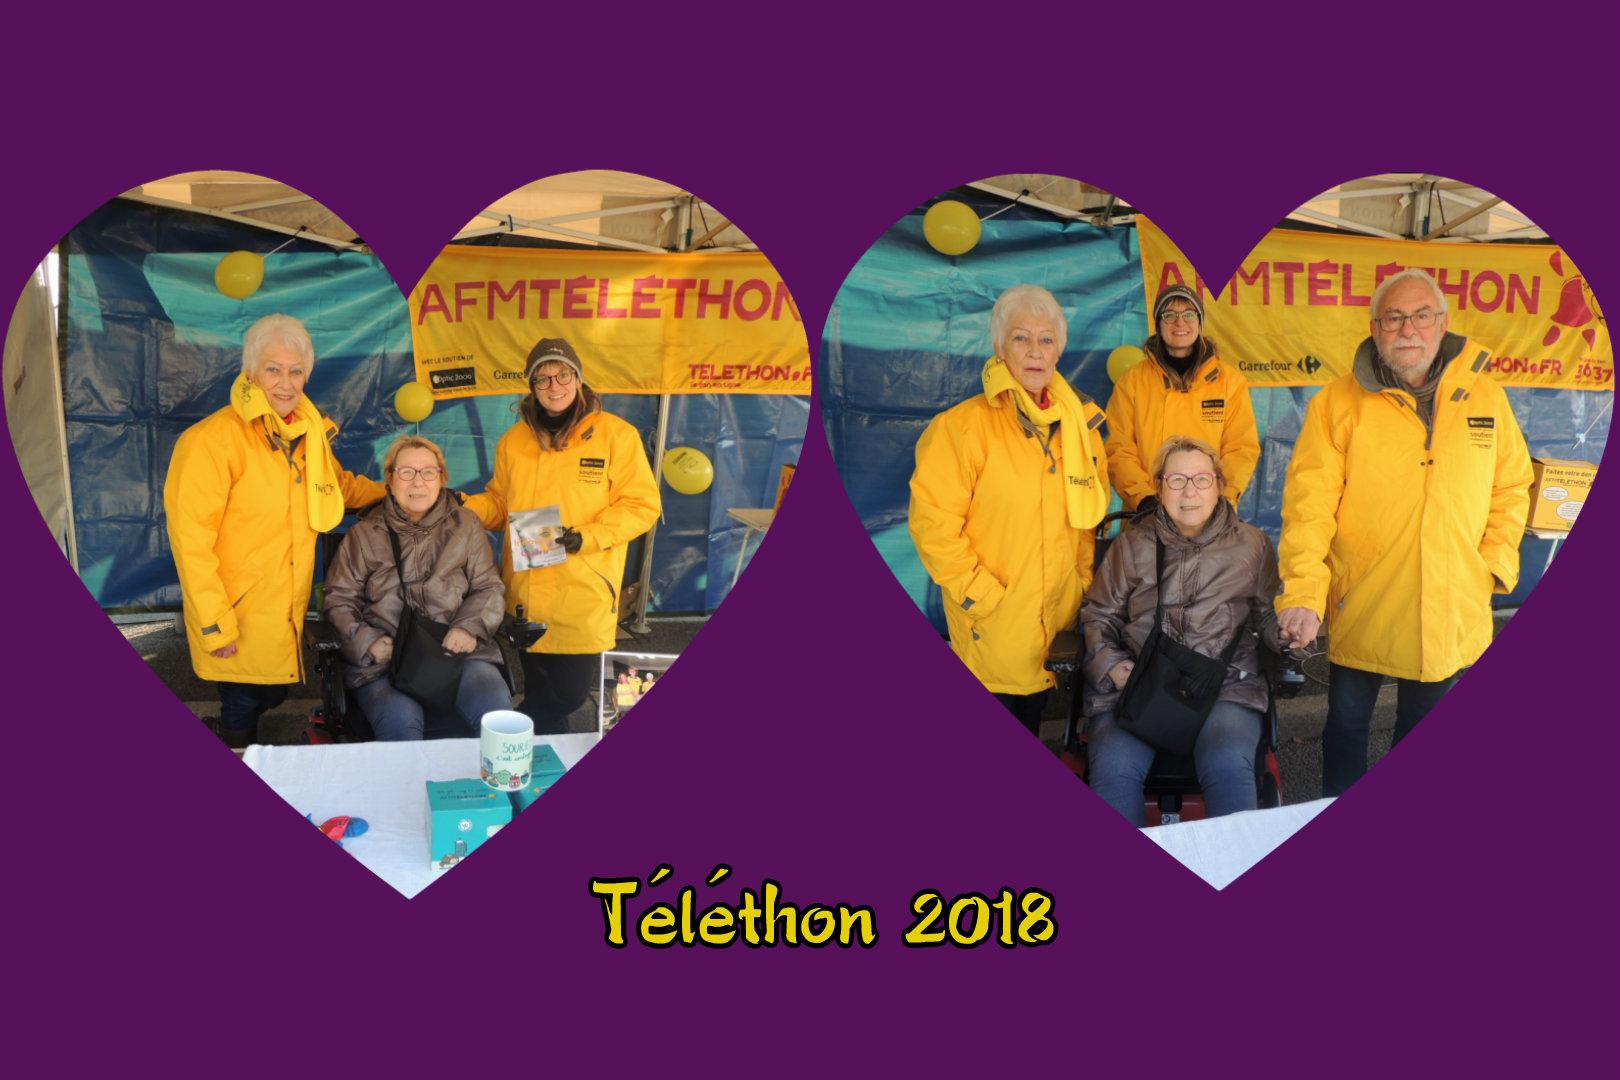 www.kizoa.com_collage_2018-11-20_22-16-21.jpg